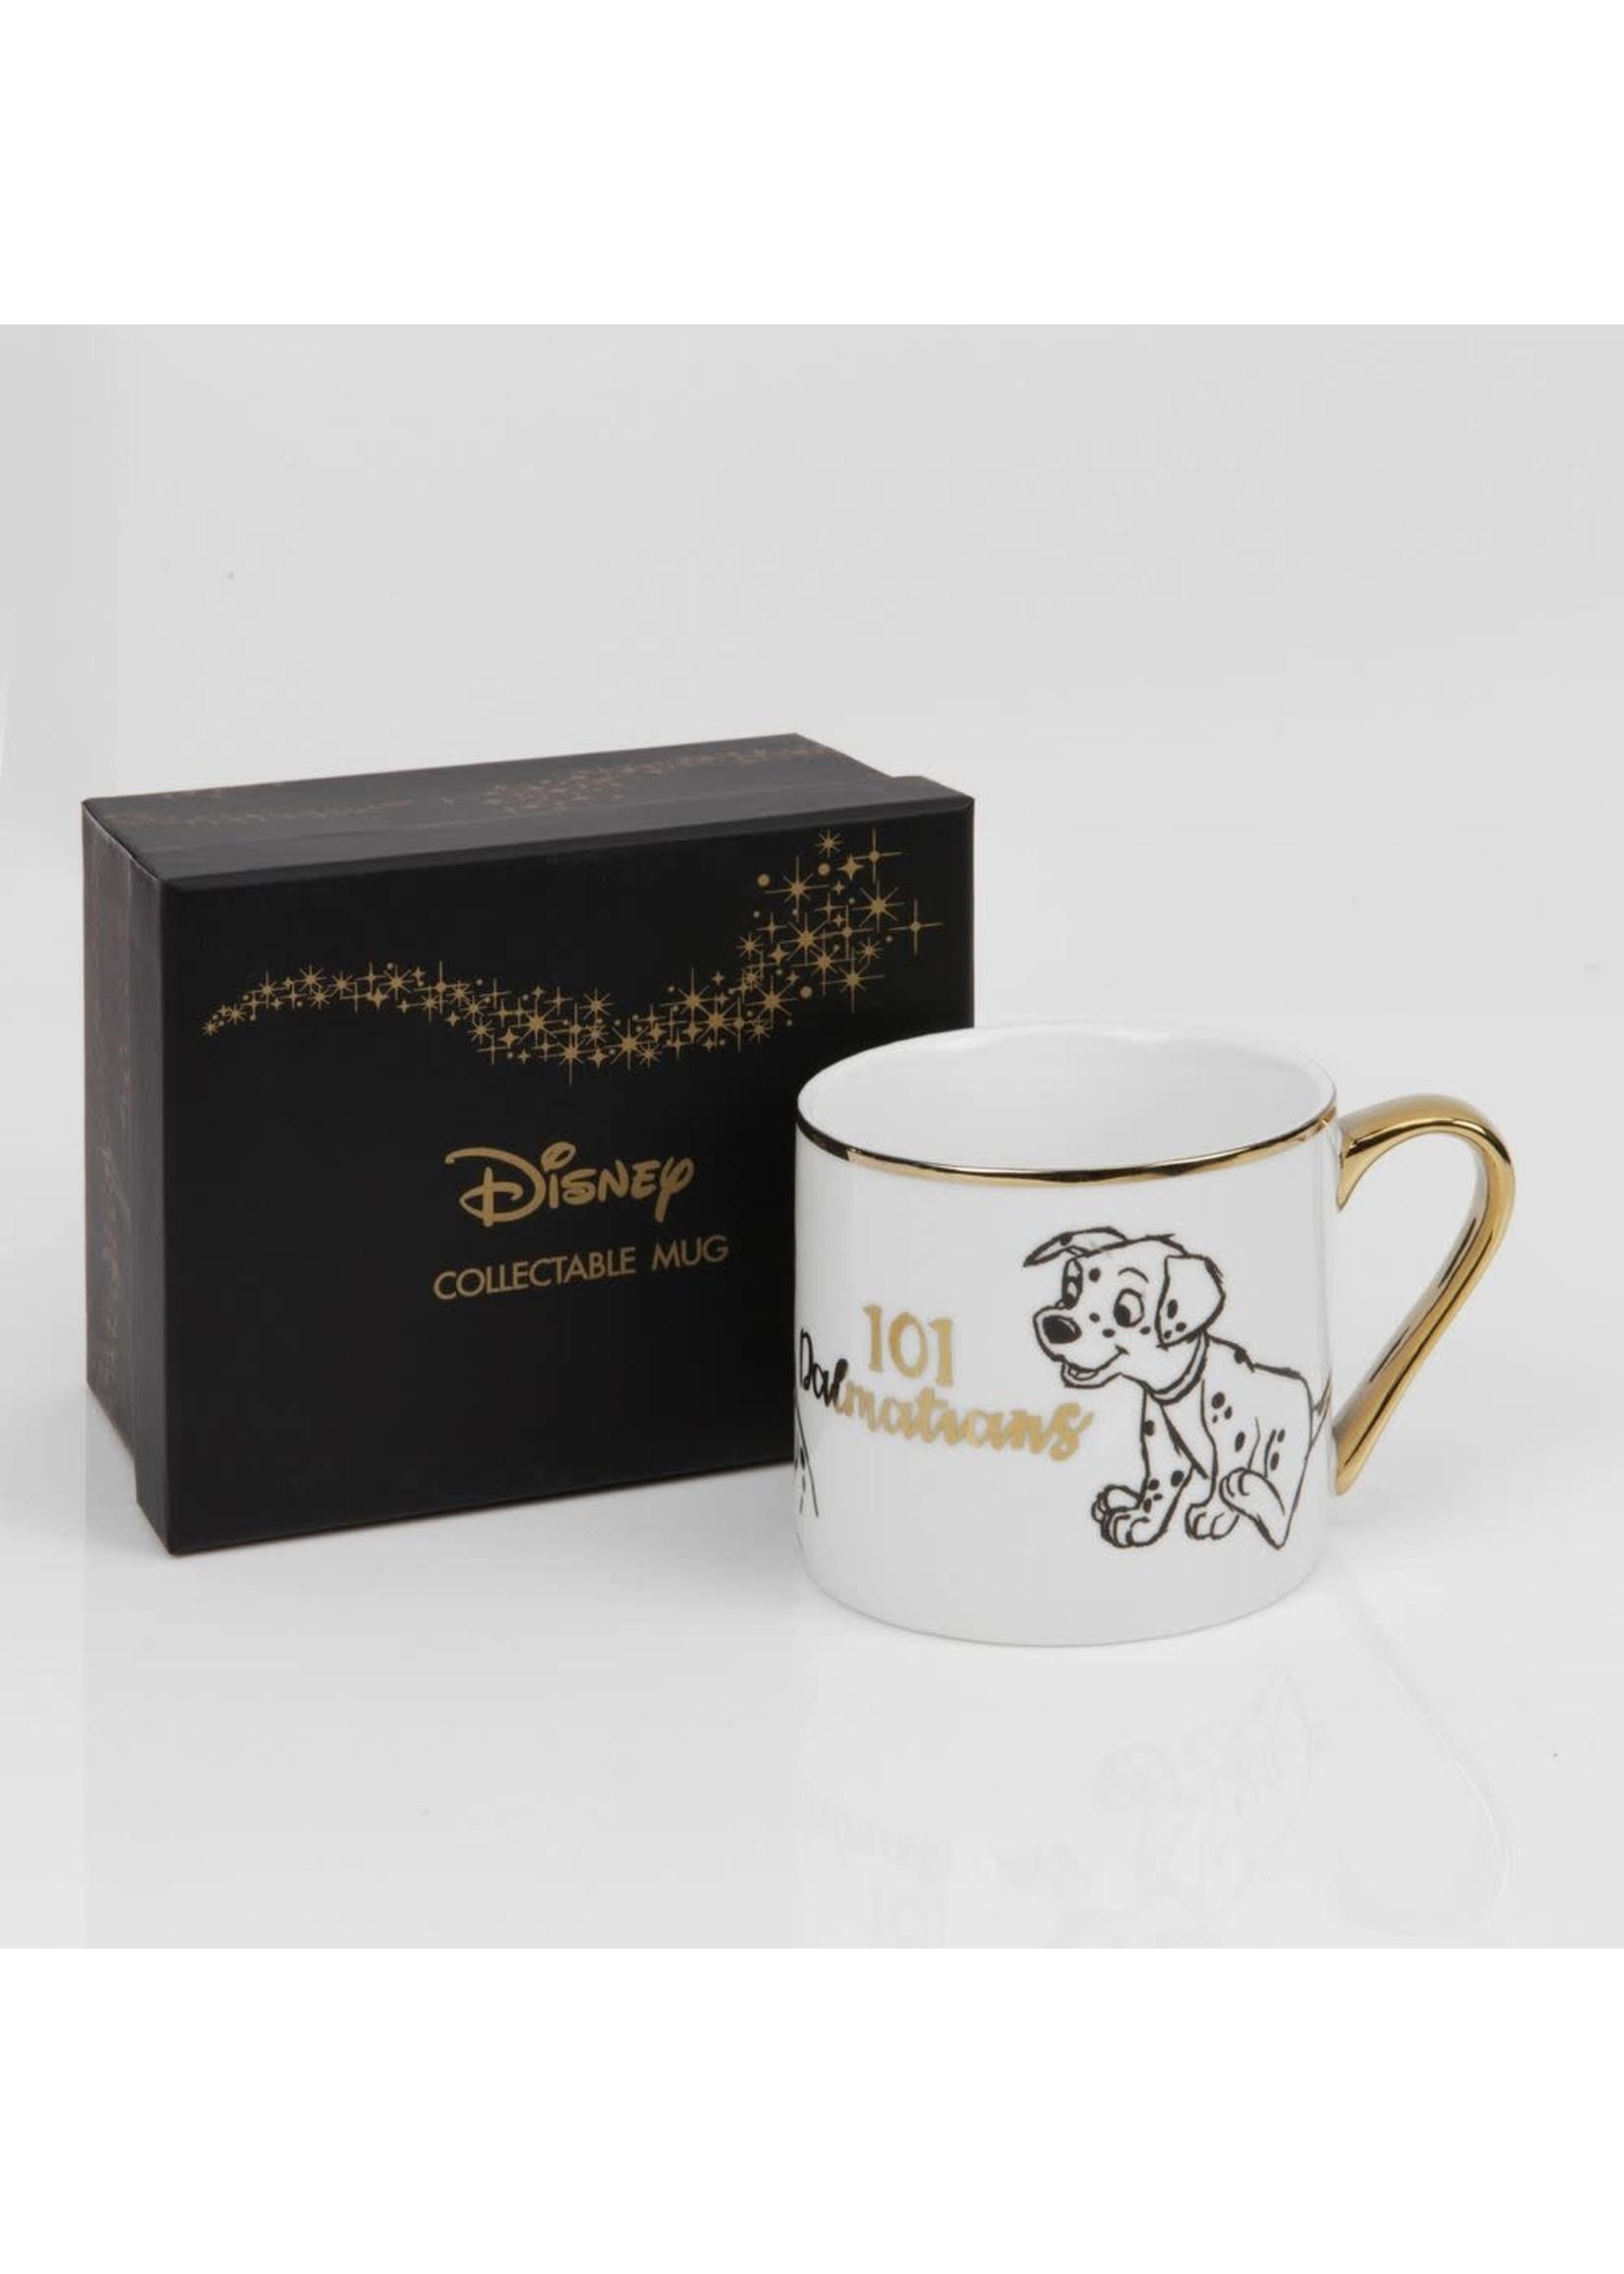 Disney DISNEY CLASSIC COLLECTABLE CHINA MUG - 101 DALMATIANS